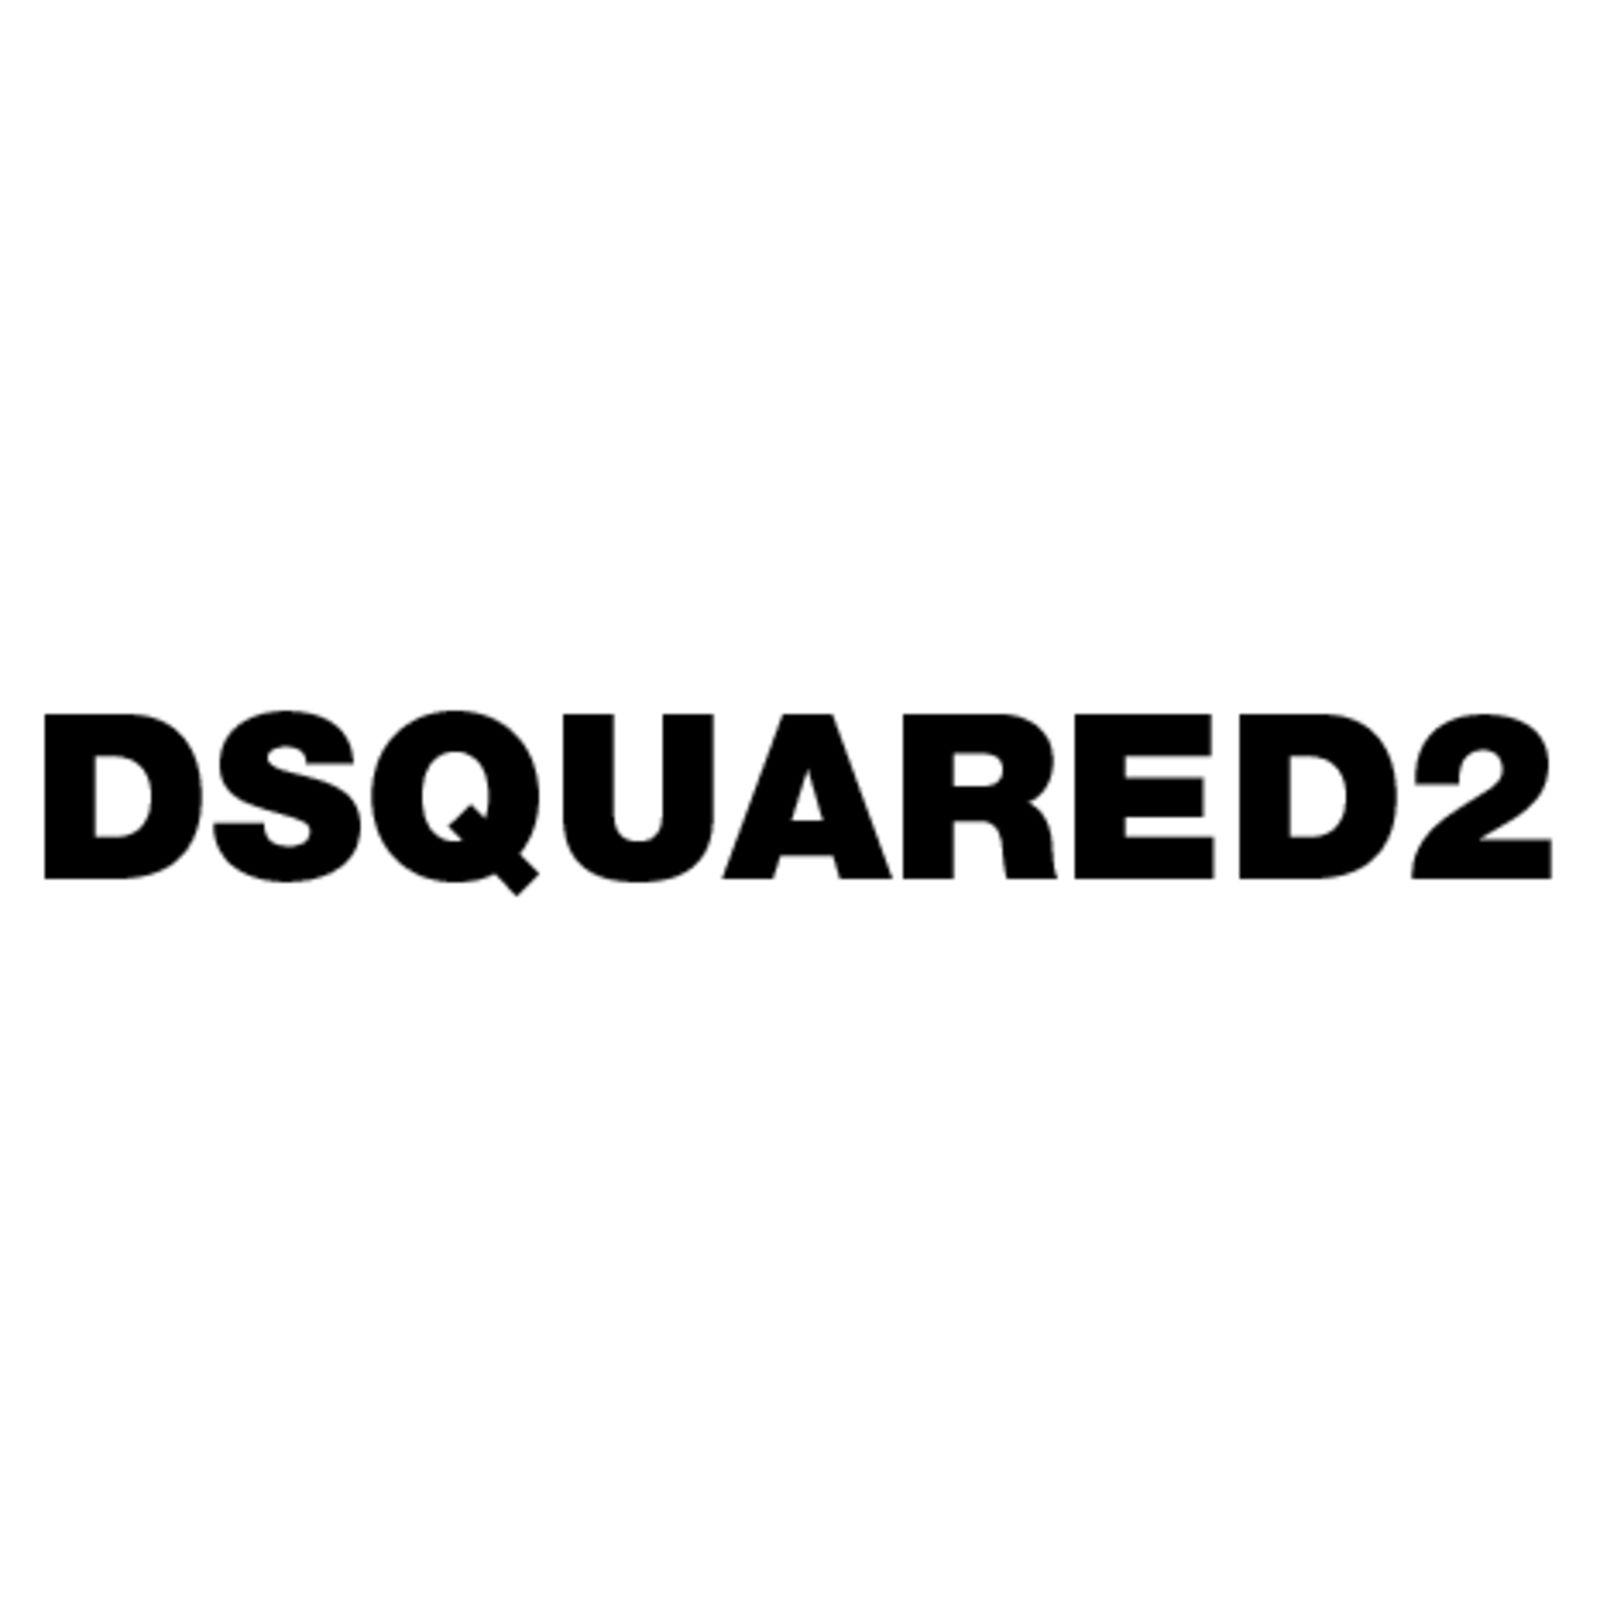 DSQUARED2 (Bild 1)